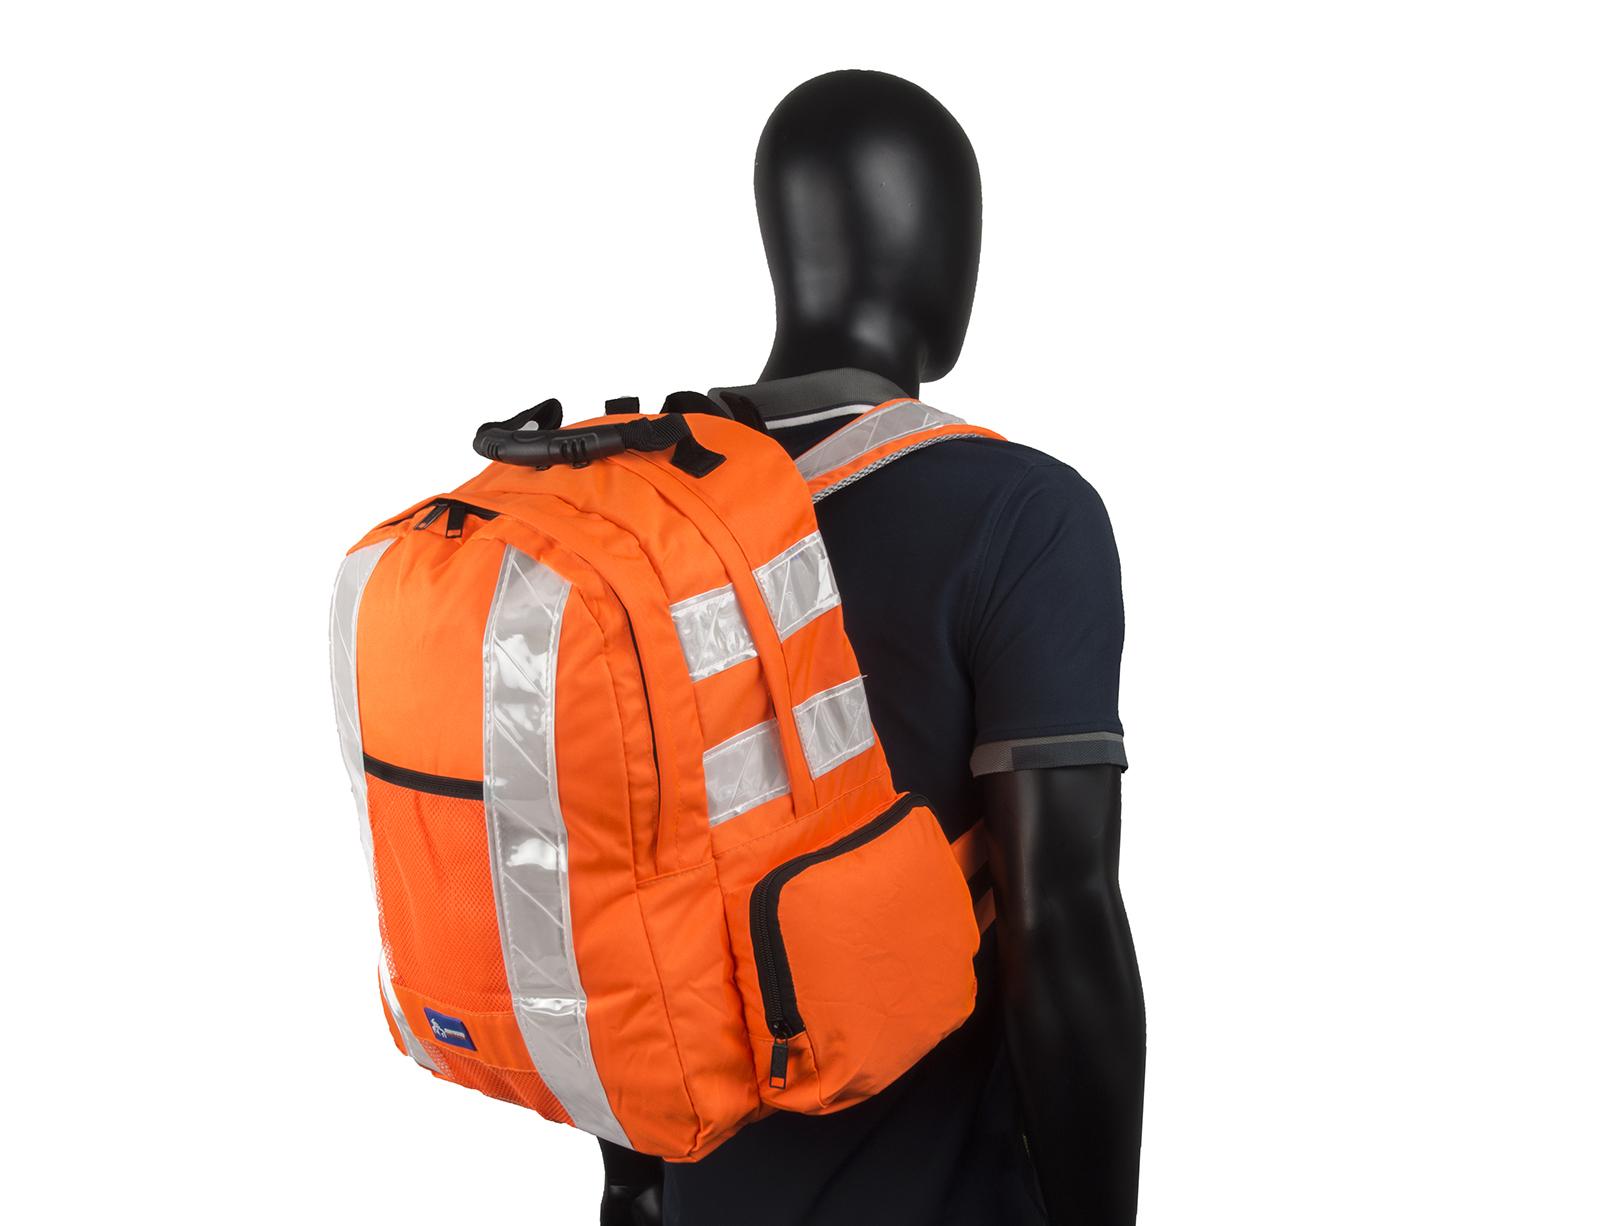 High Vis Backpack Work Rucksack w/ Anti-Entanglement System & Reflective Stripes